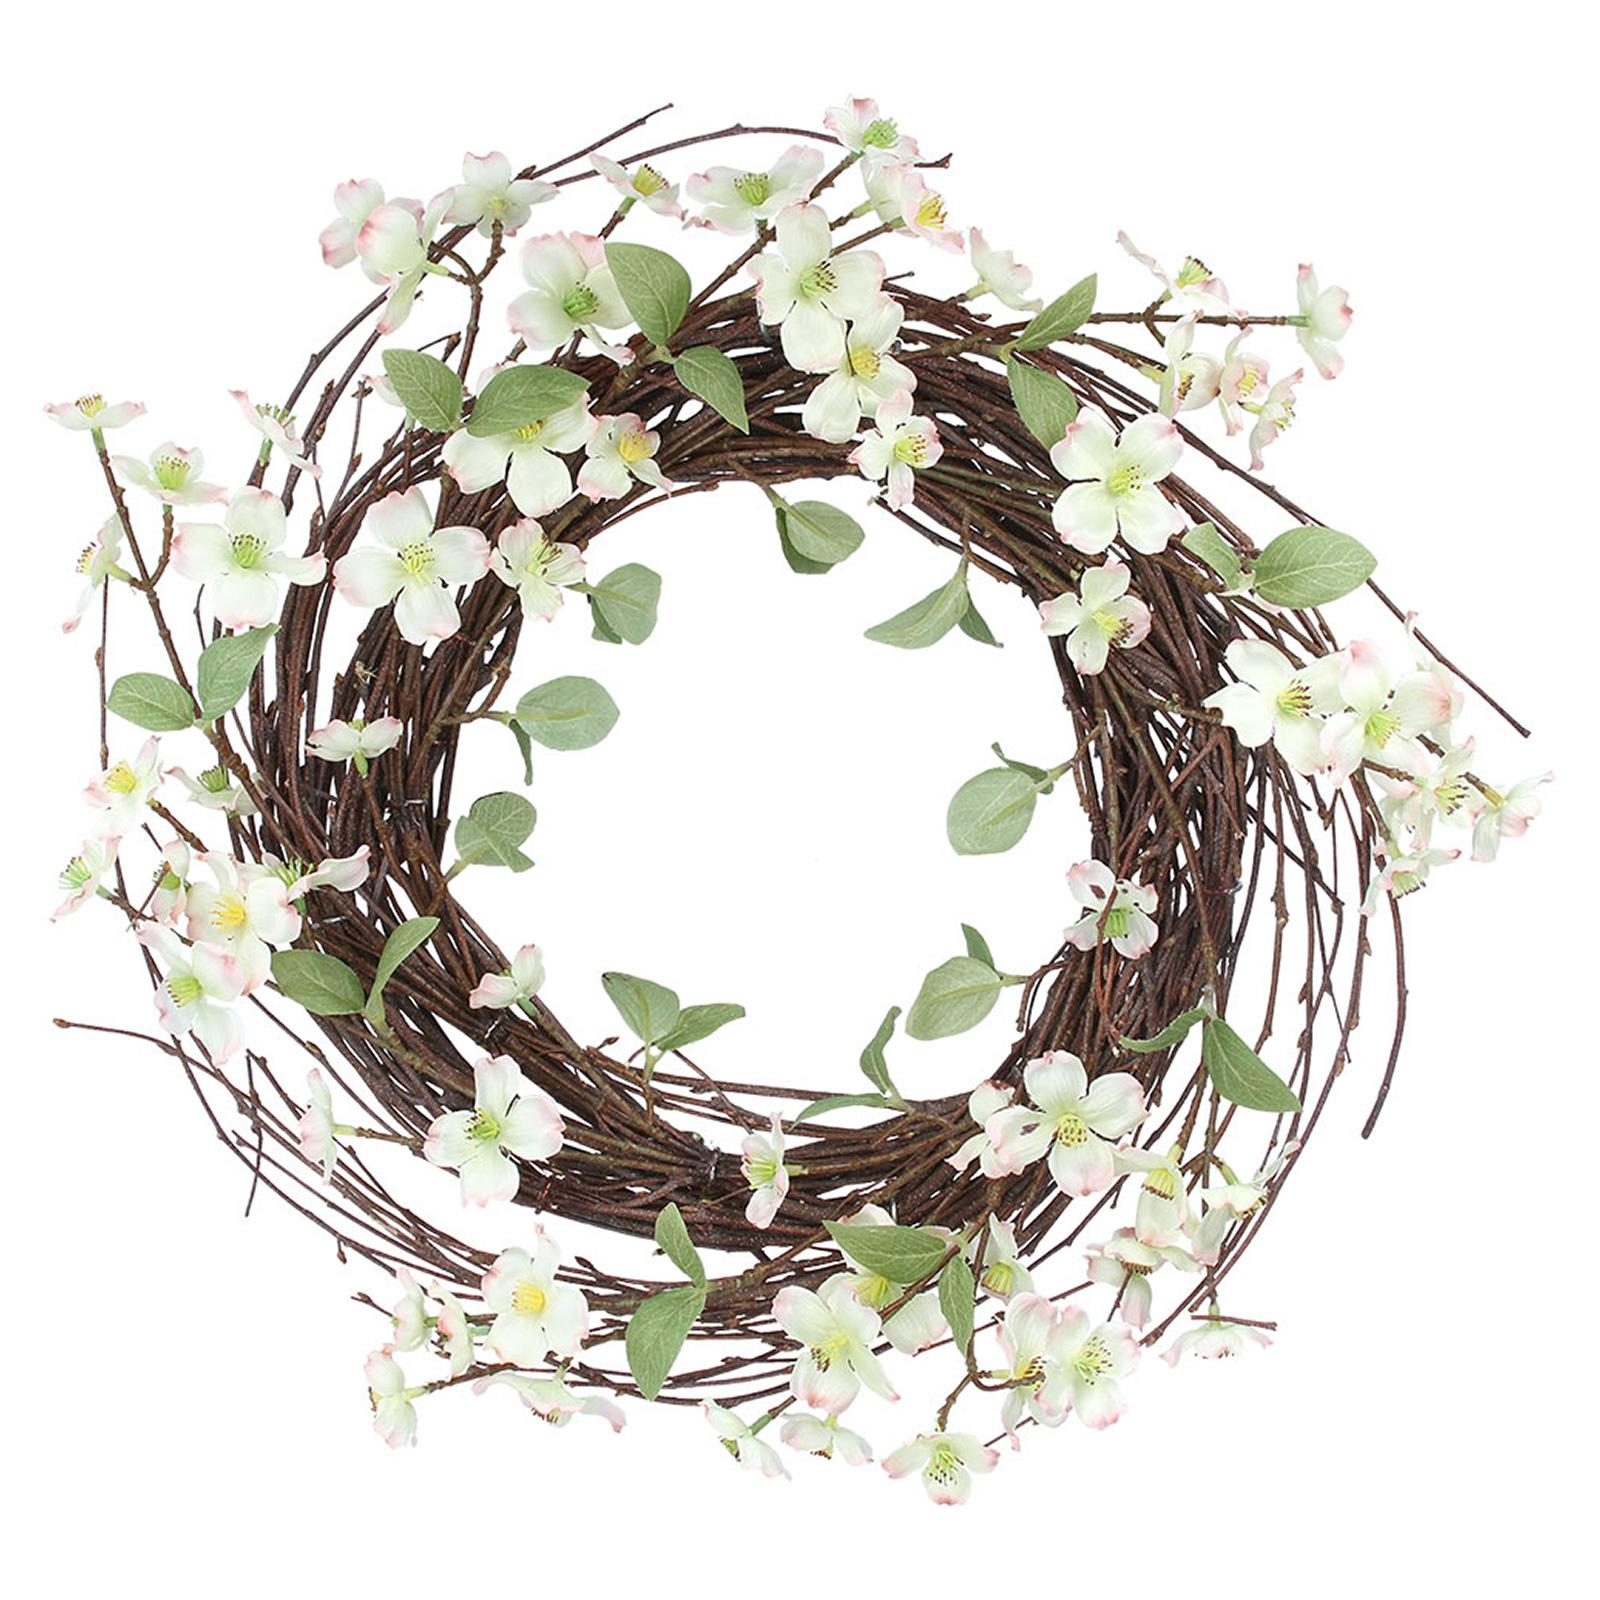 Gisela-Graham-Primavera-Corona-Decoracion-de-Mesa-de-huevos-de-Pascua-Flores-Casa-Puerta-Floral miniatura 16